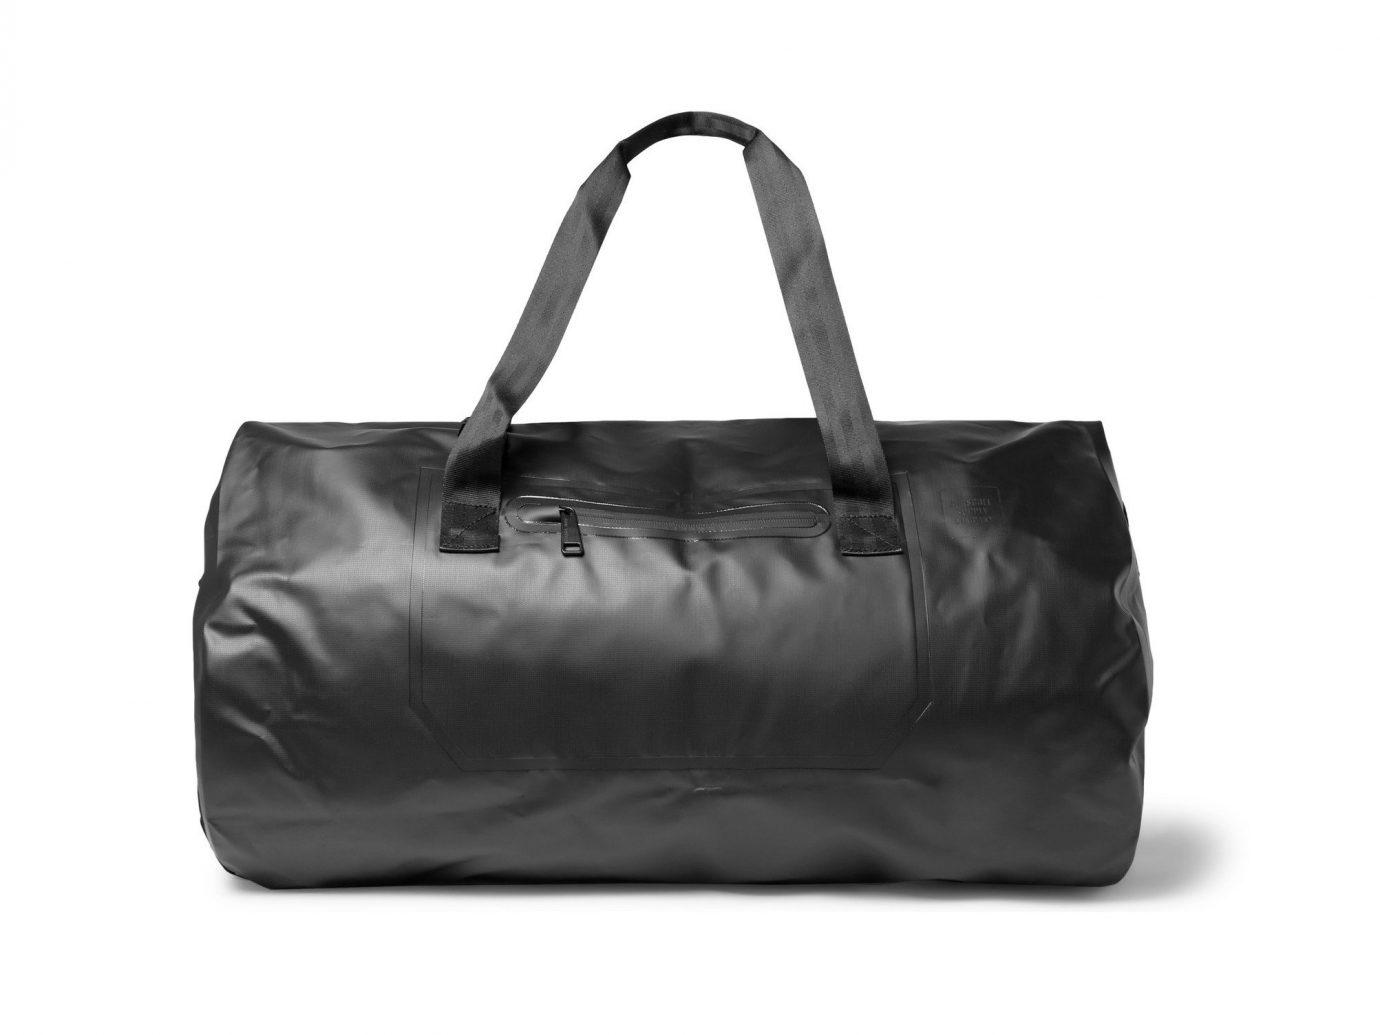 Style + Design Travel Shop bag black handbag shoulder bag leather product hand luggage product design luggage & bags brand tote bag duffel bag